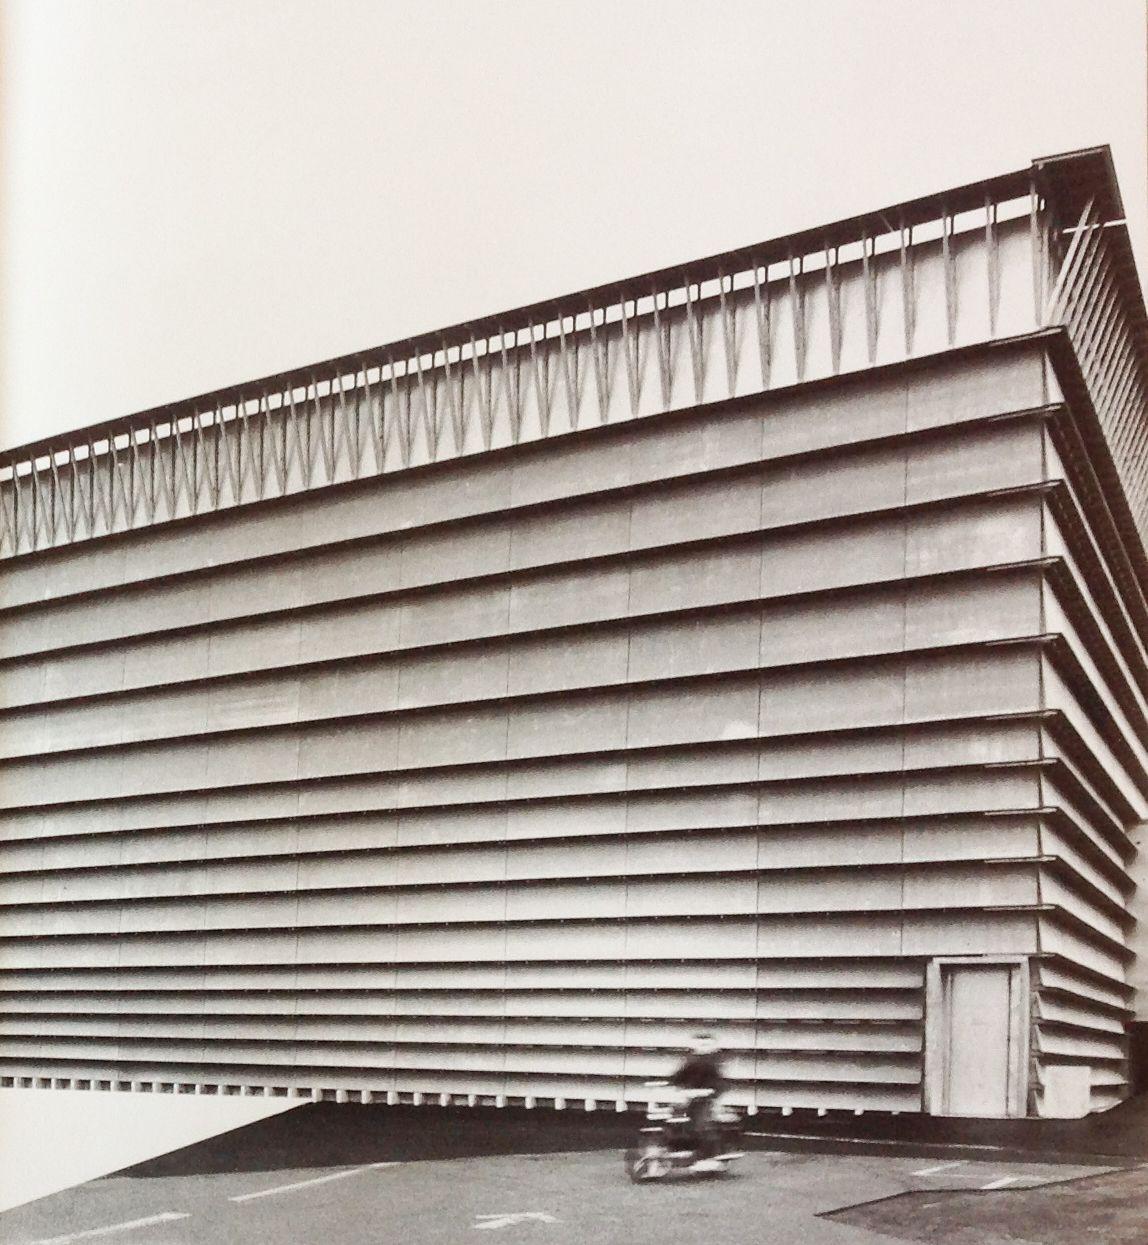 Garage Laufen: Genericarchitecture: Ricola Warehouse Building Herzog De